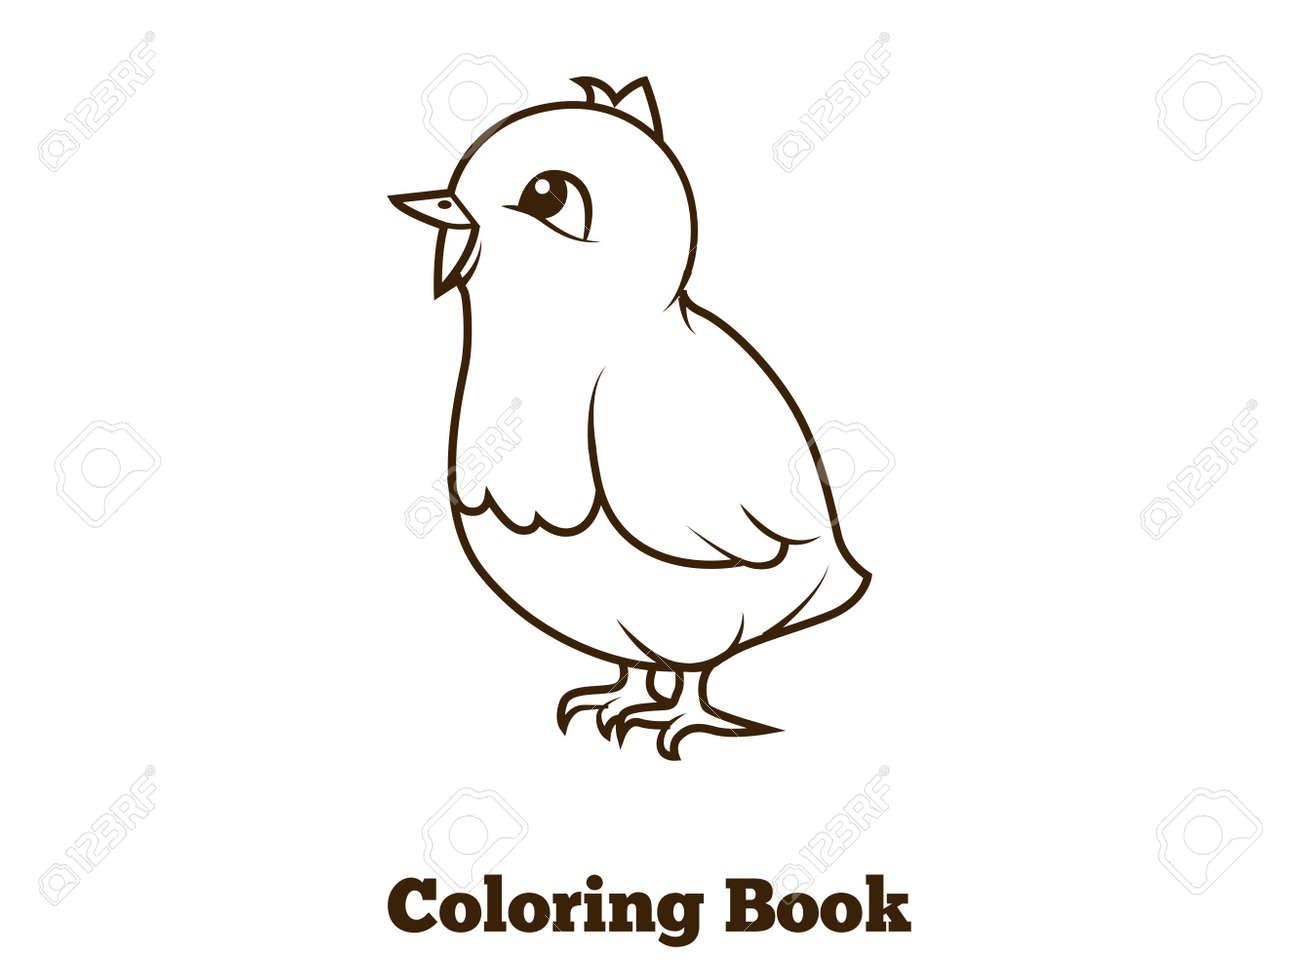 De Dibujos Animados De Pollo Libro Para Colorear Ilustración ...